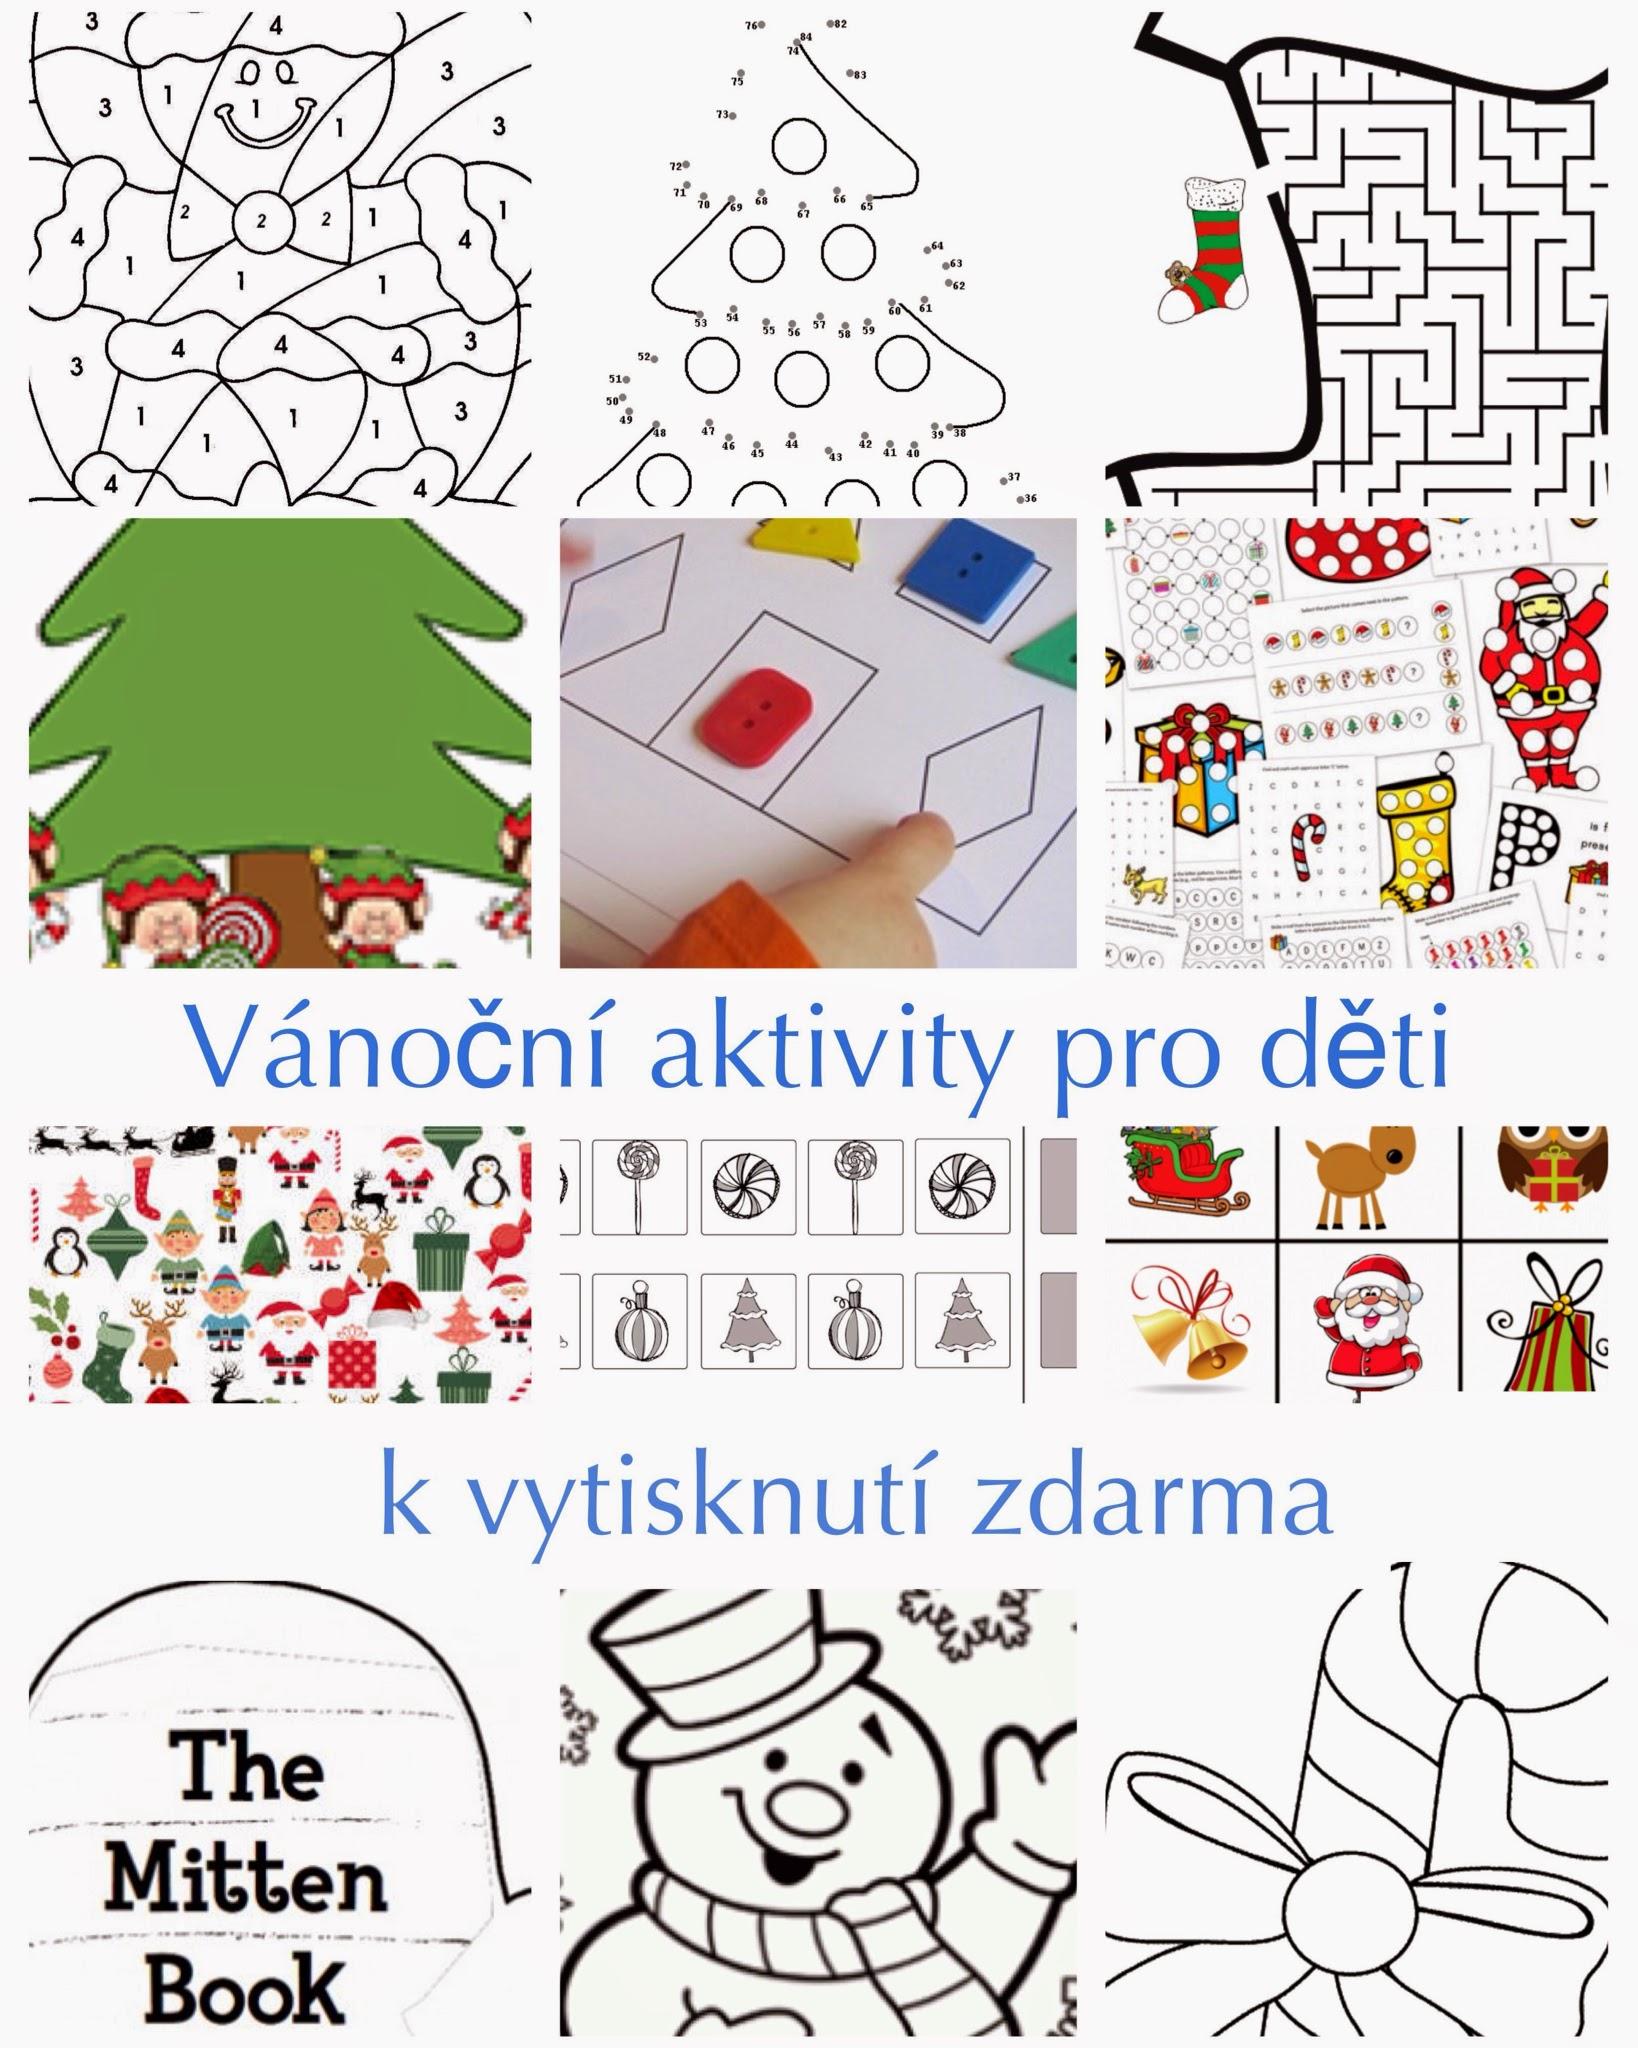 Vanocni Pracovni Listy Pro Male Deti K Vytisknuti Zdarma